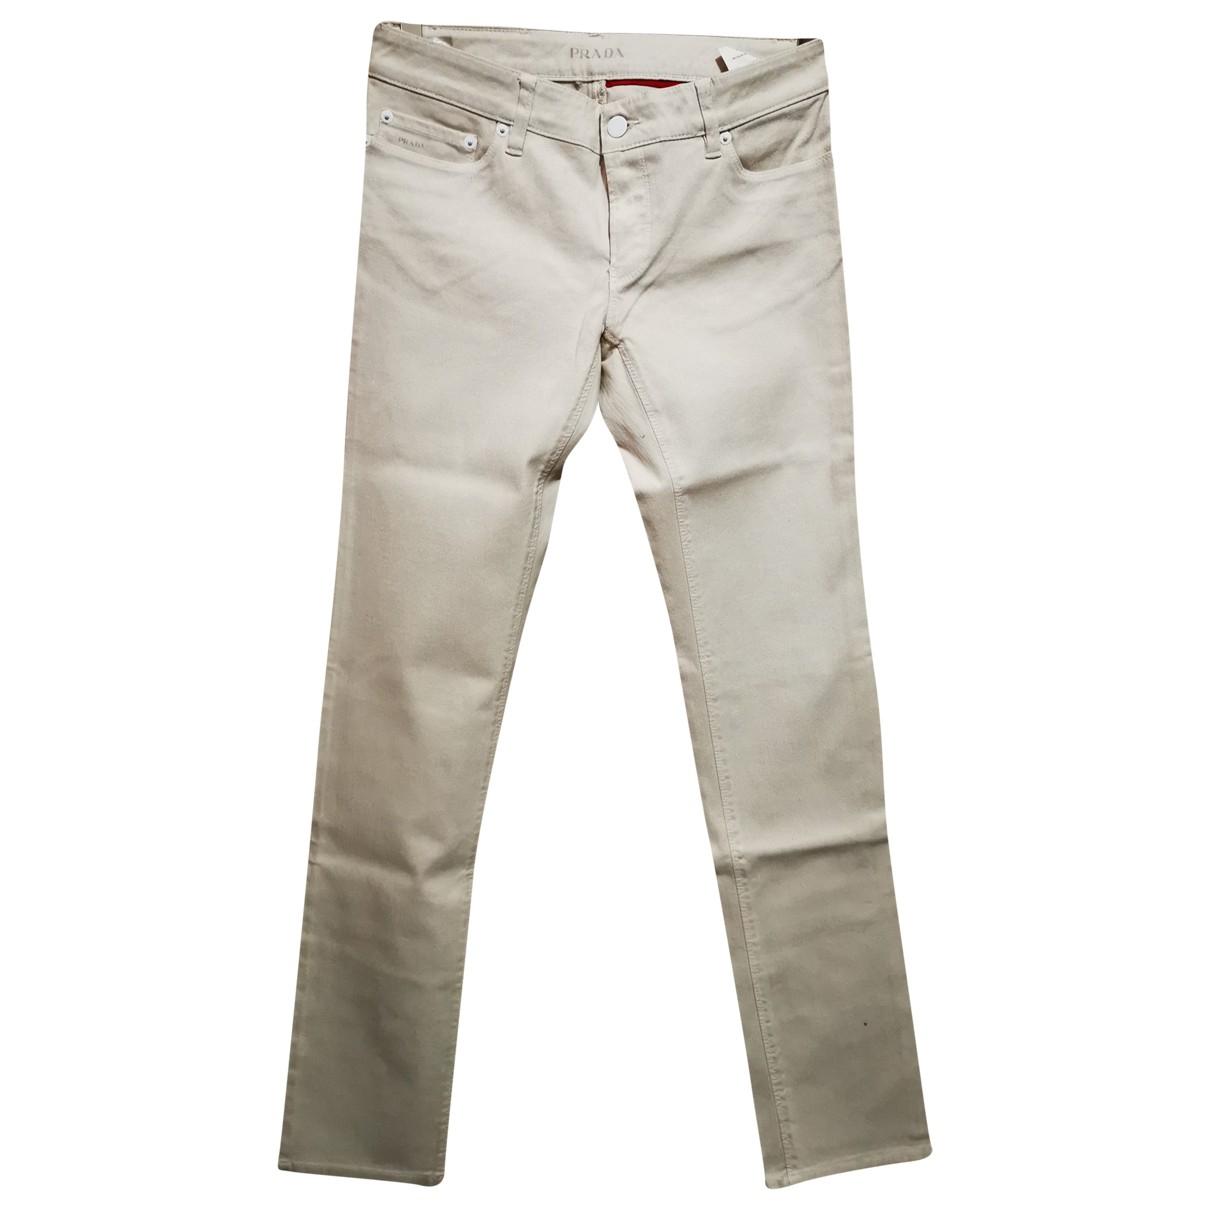 Prada N Ecru Cotton - elasthane Jeans for Women 27 US